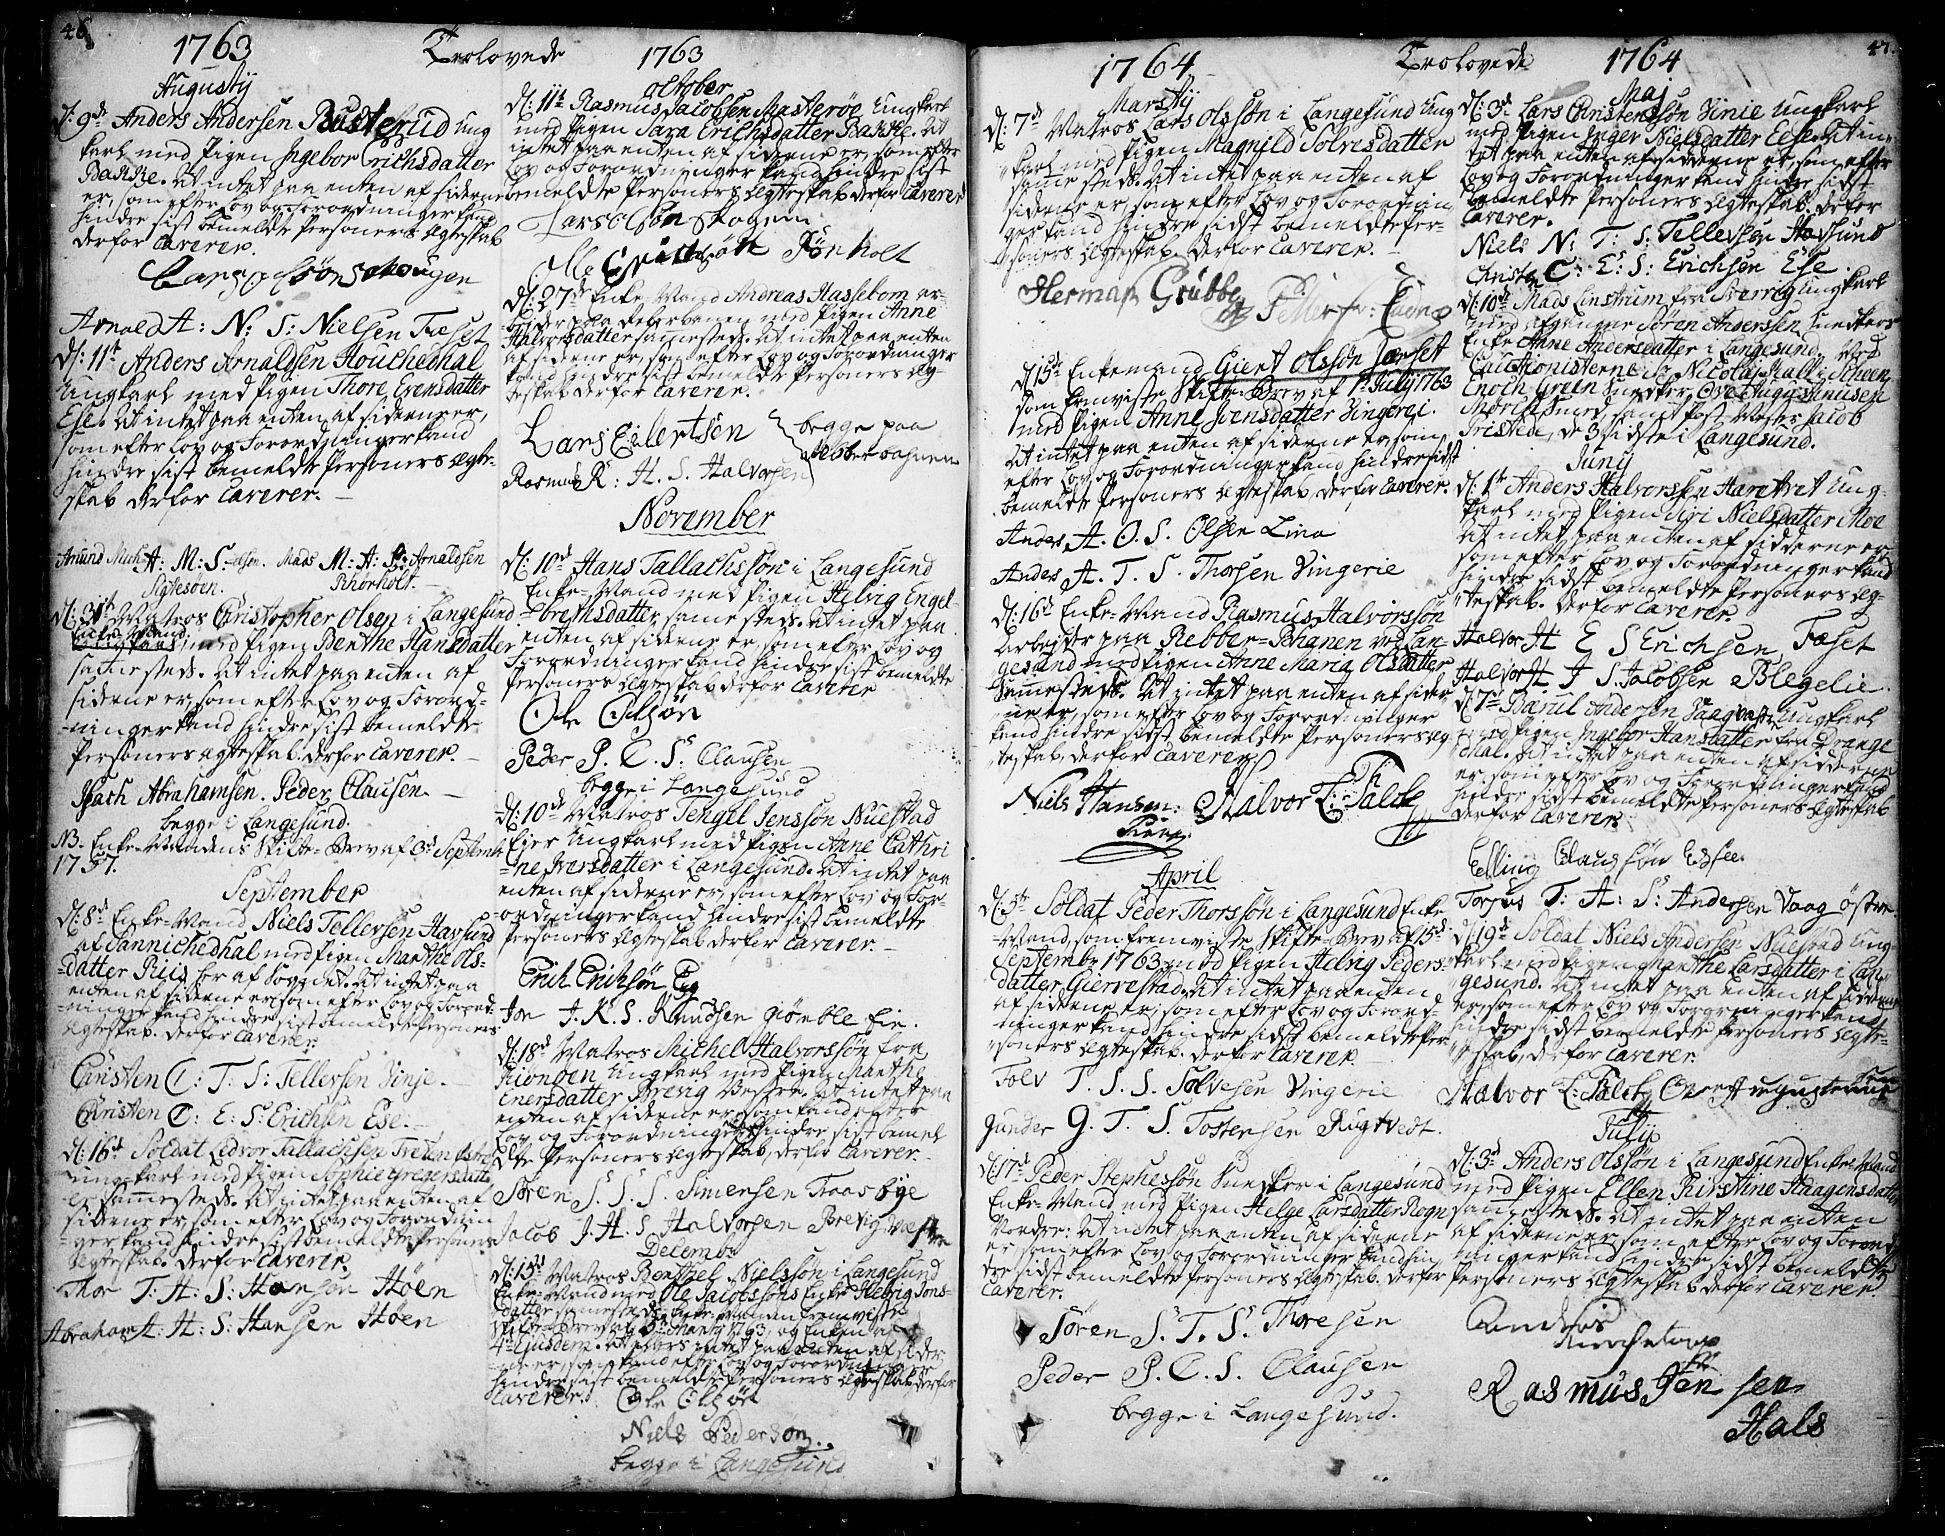 SAKO, Bamble kirkebøker, F/Fa/L0001: Ministerialbok nr. I 1, 1702-1774, s. 46-47